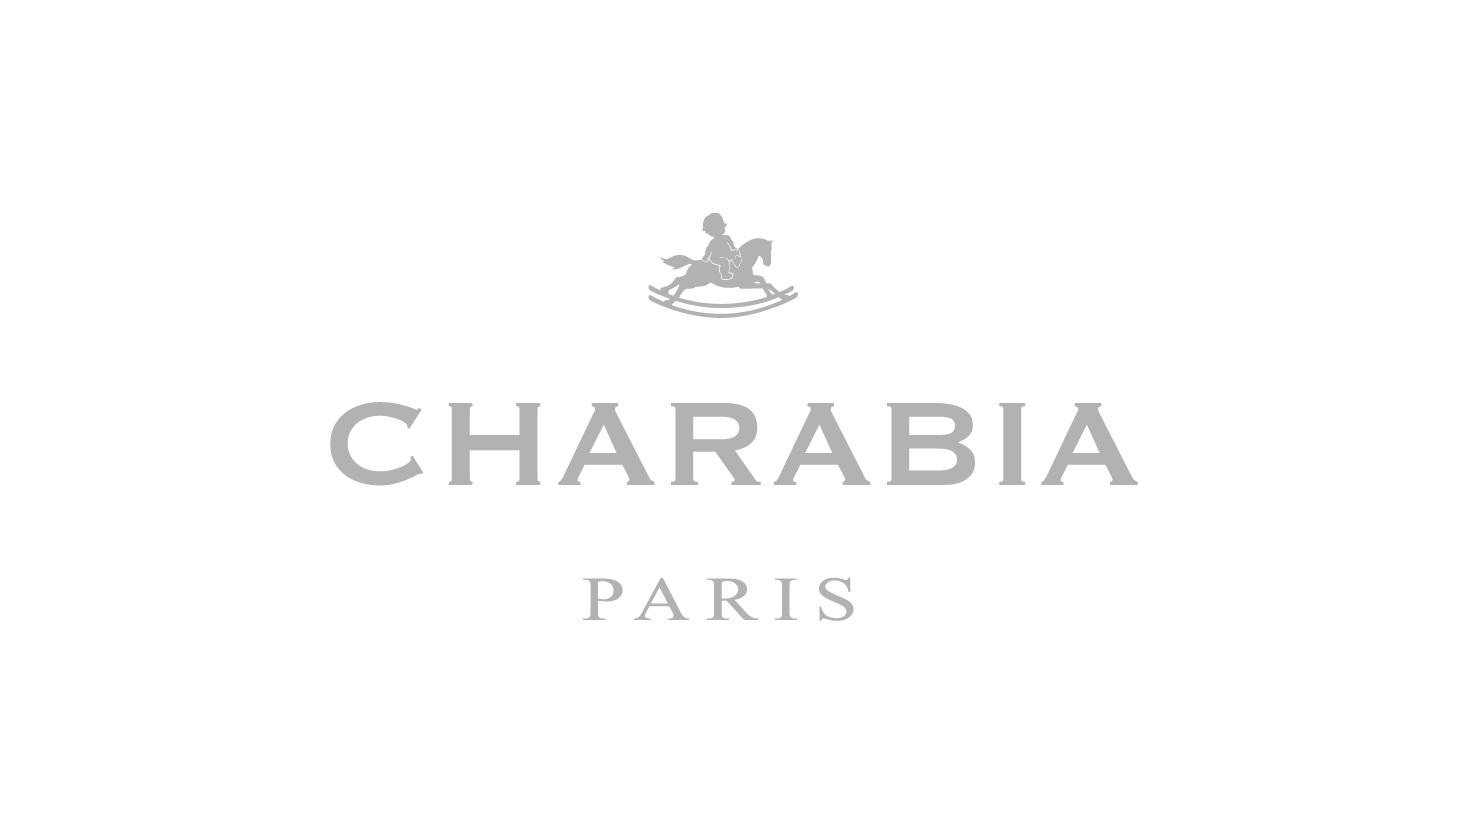 charabia.png